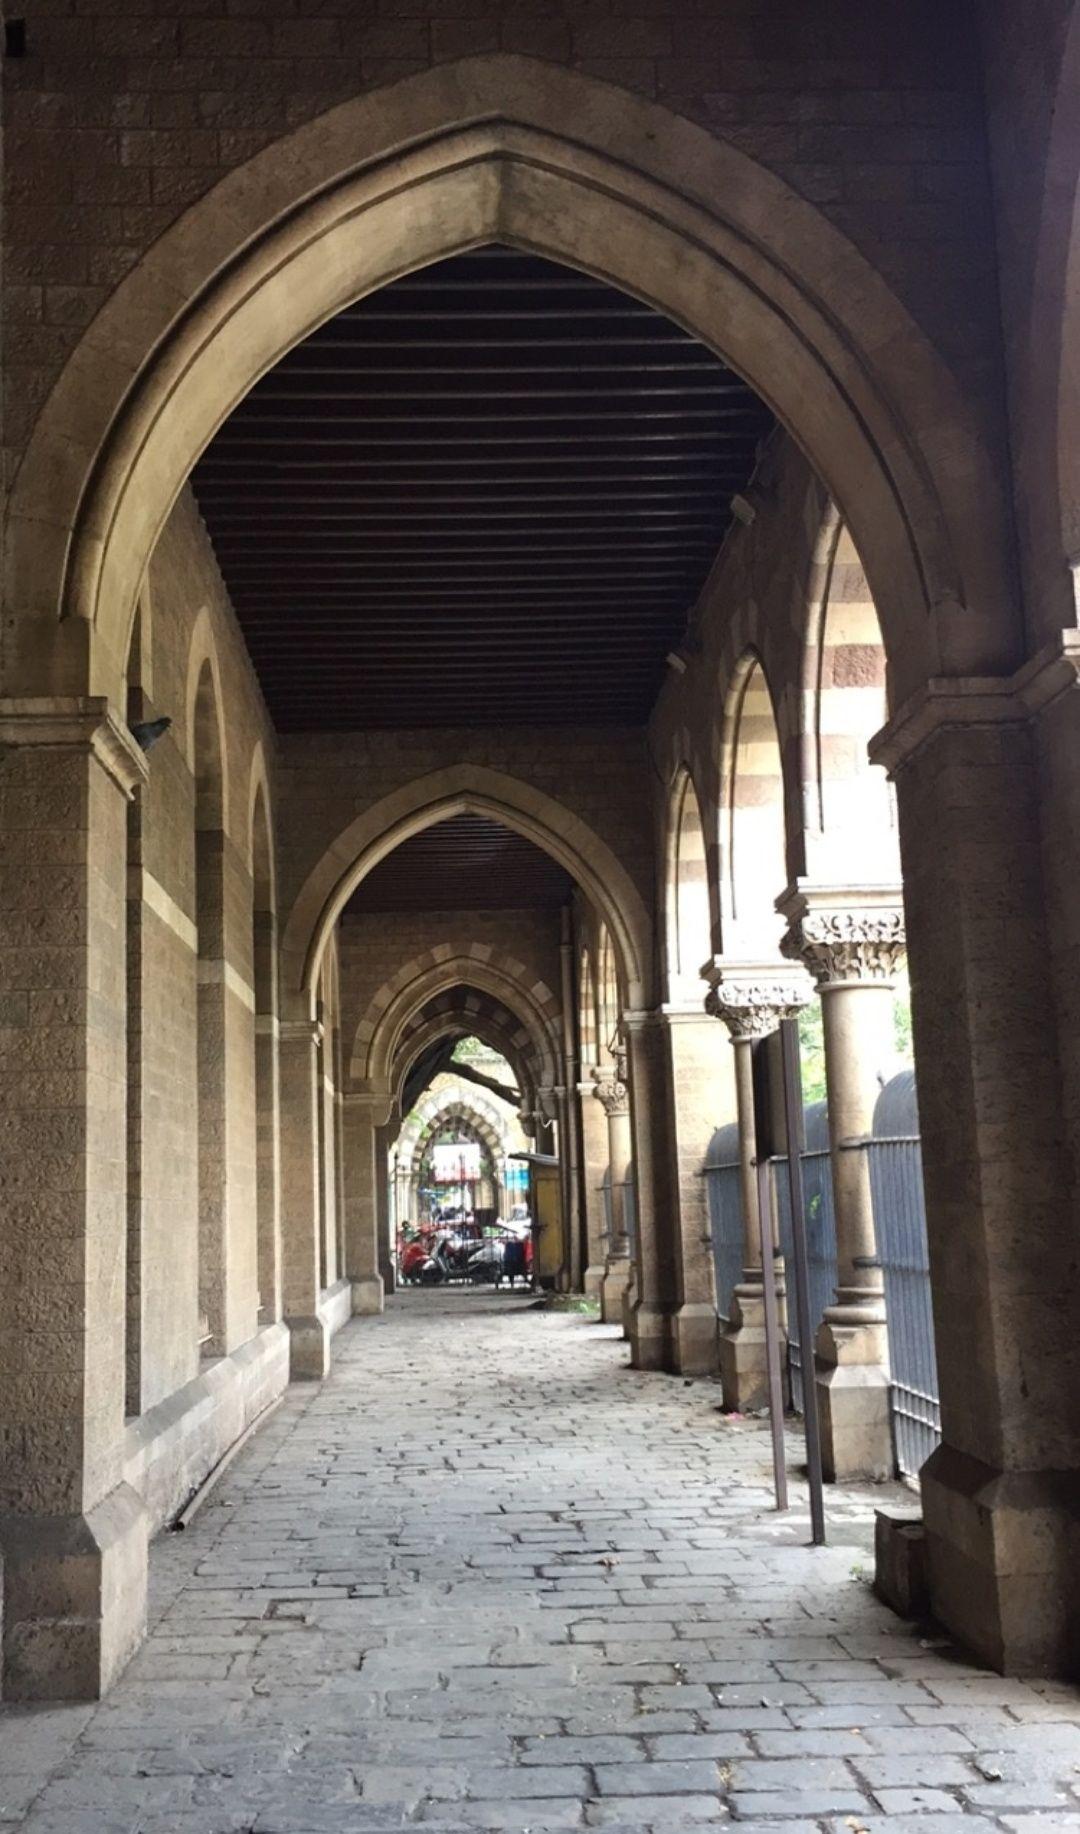 Photo of Elphinstone College By Mayur Madhavi